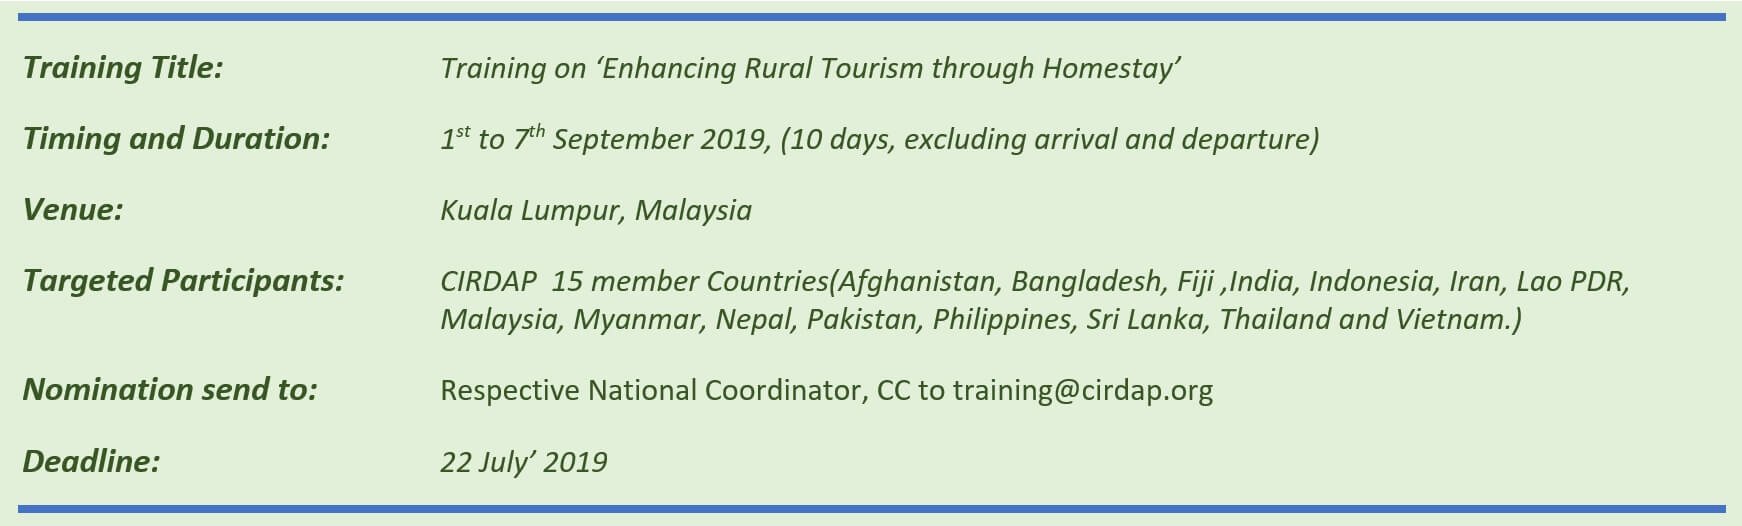 Int  Training on 'Enhancing Rural Tourism through Homestay